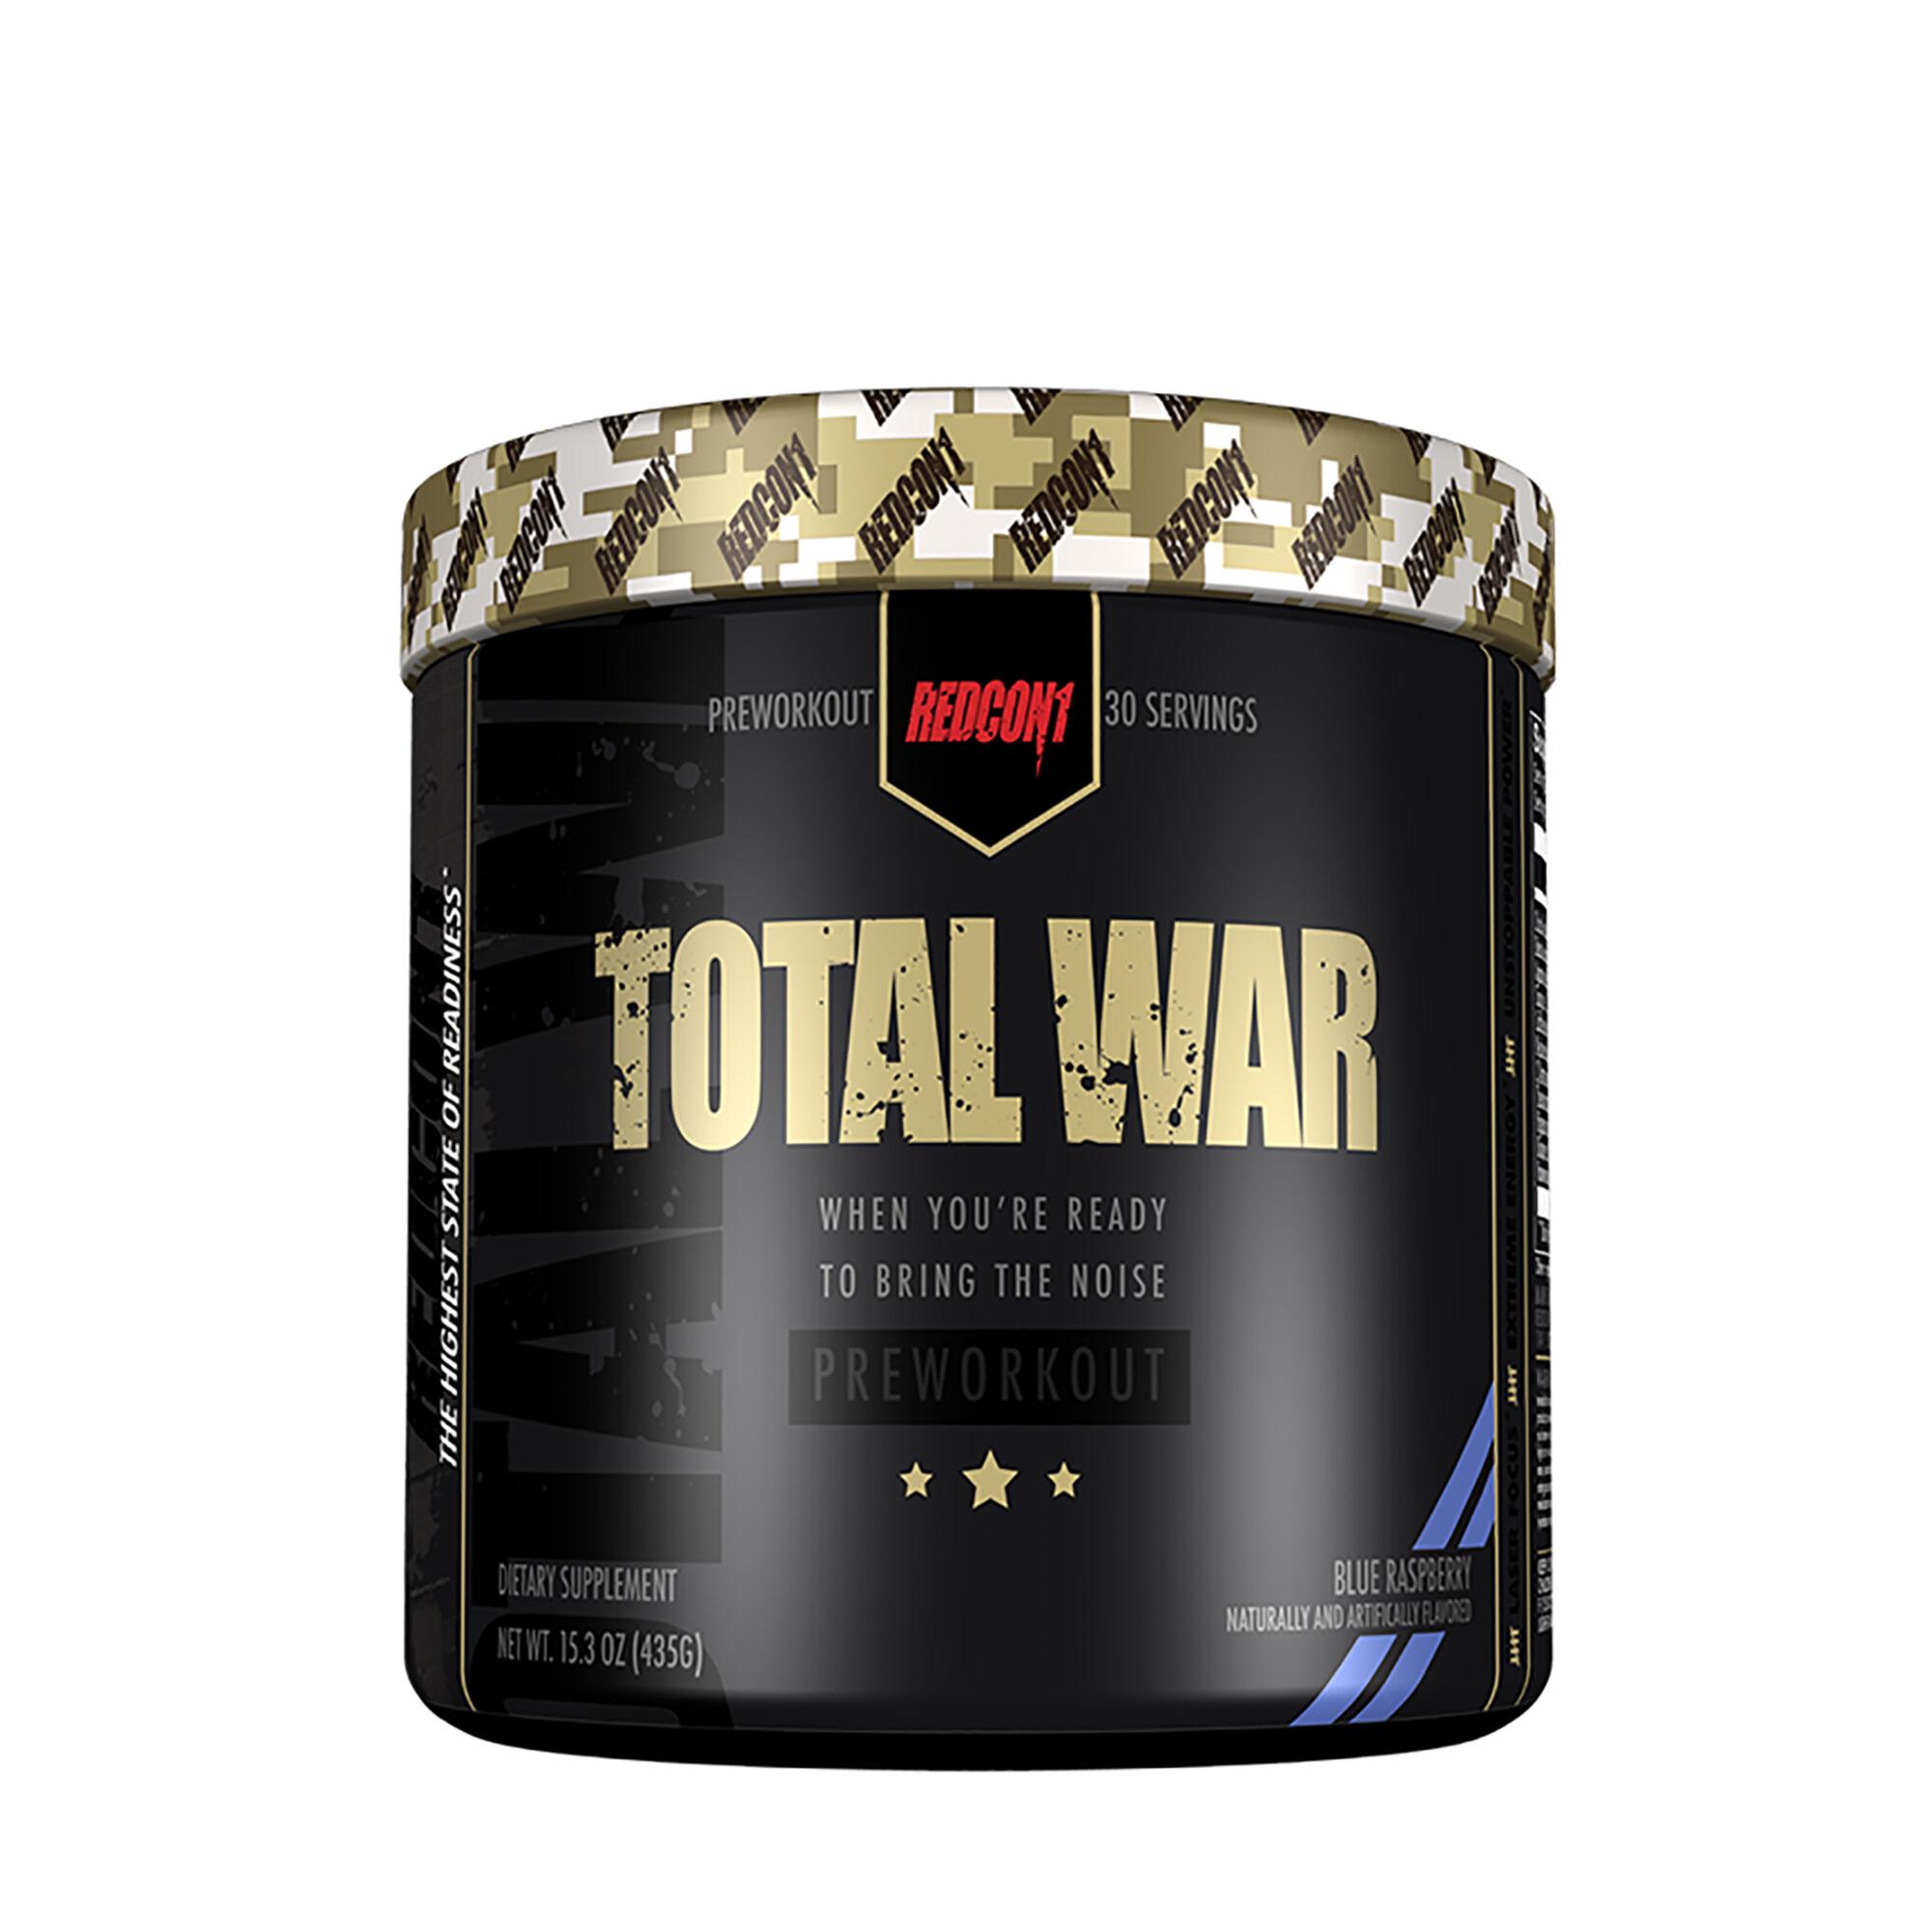 Image result for total war pre workout